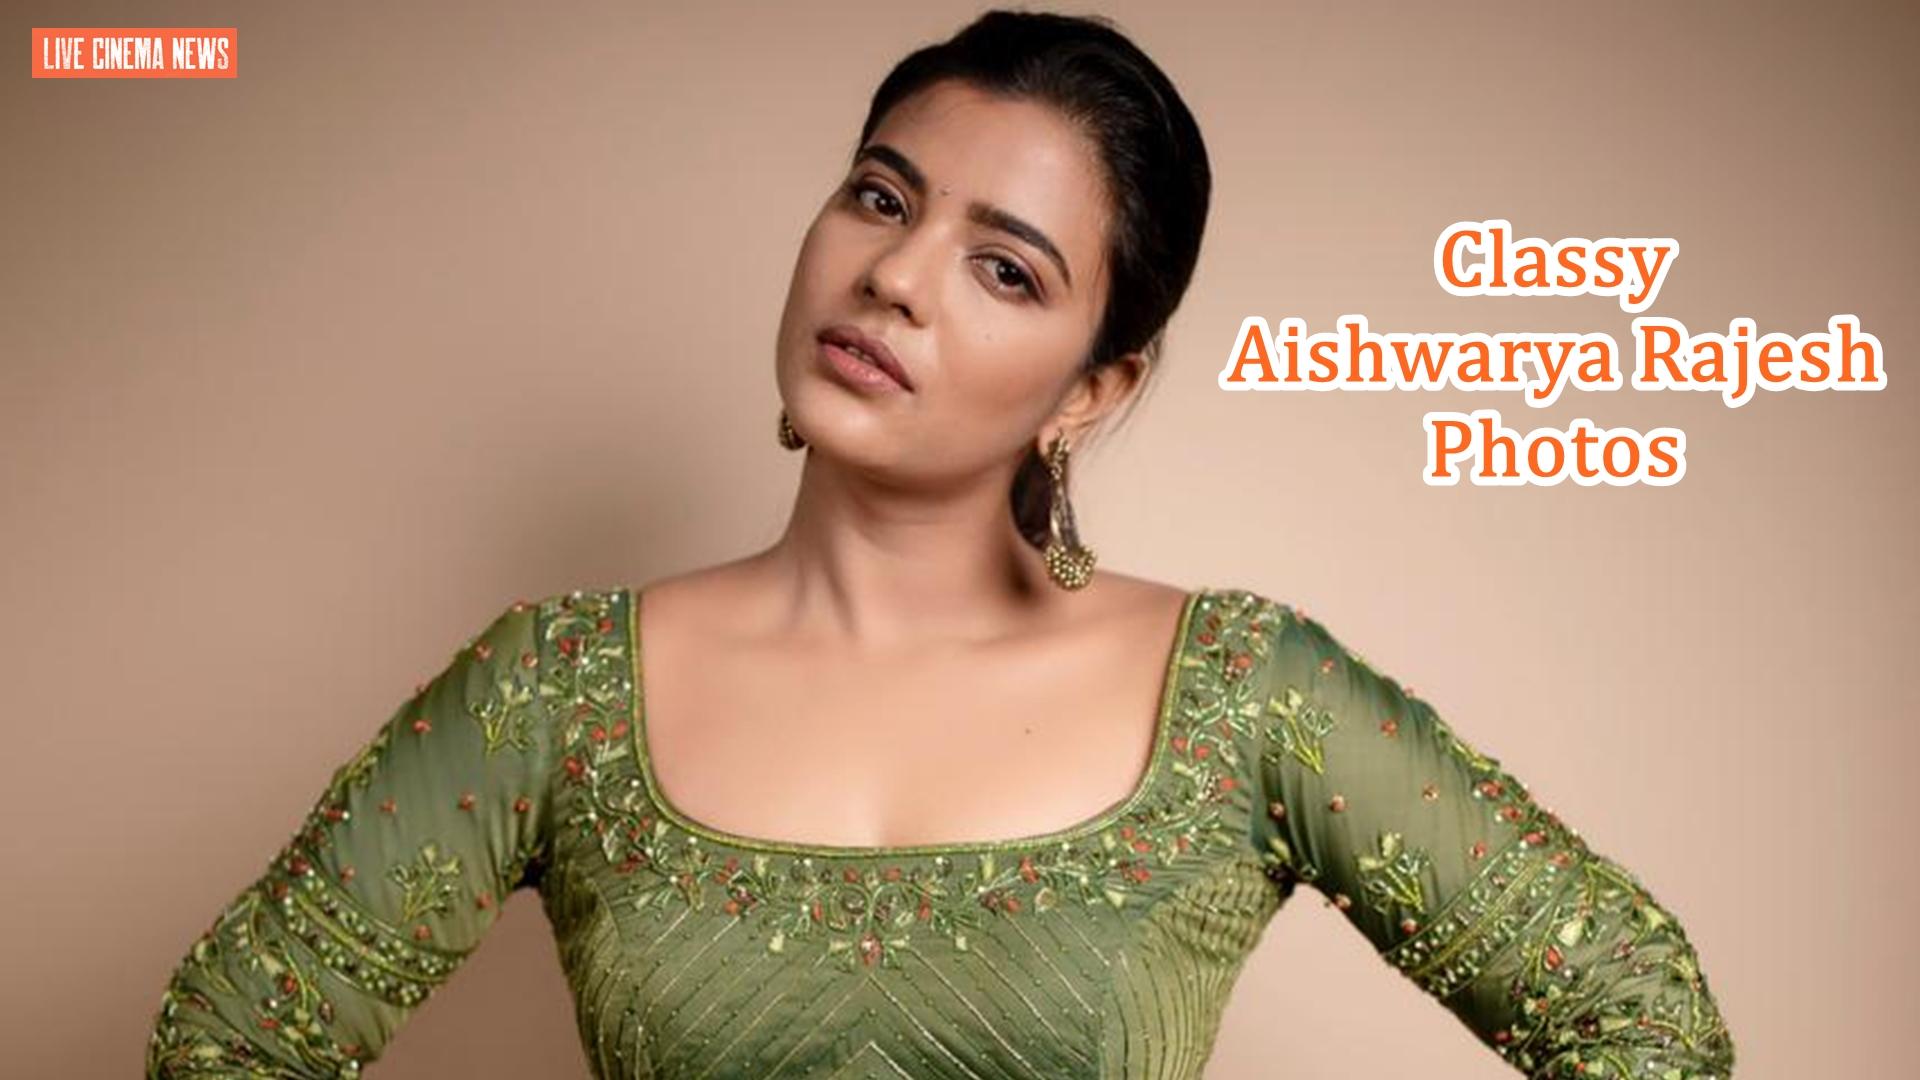 Classy Aishwarya Rajesh Photos